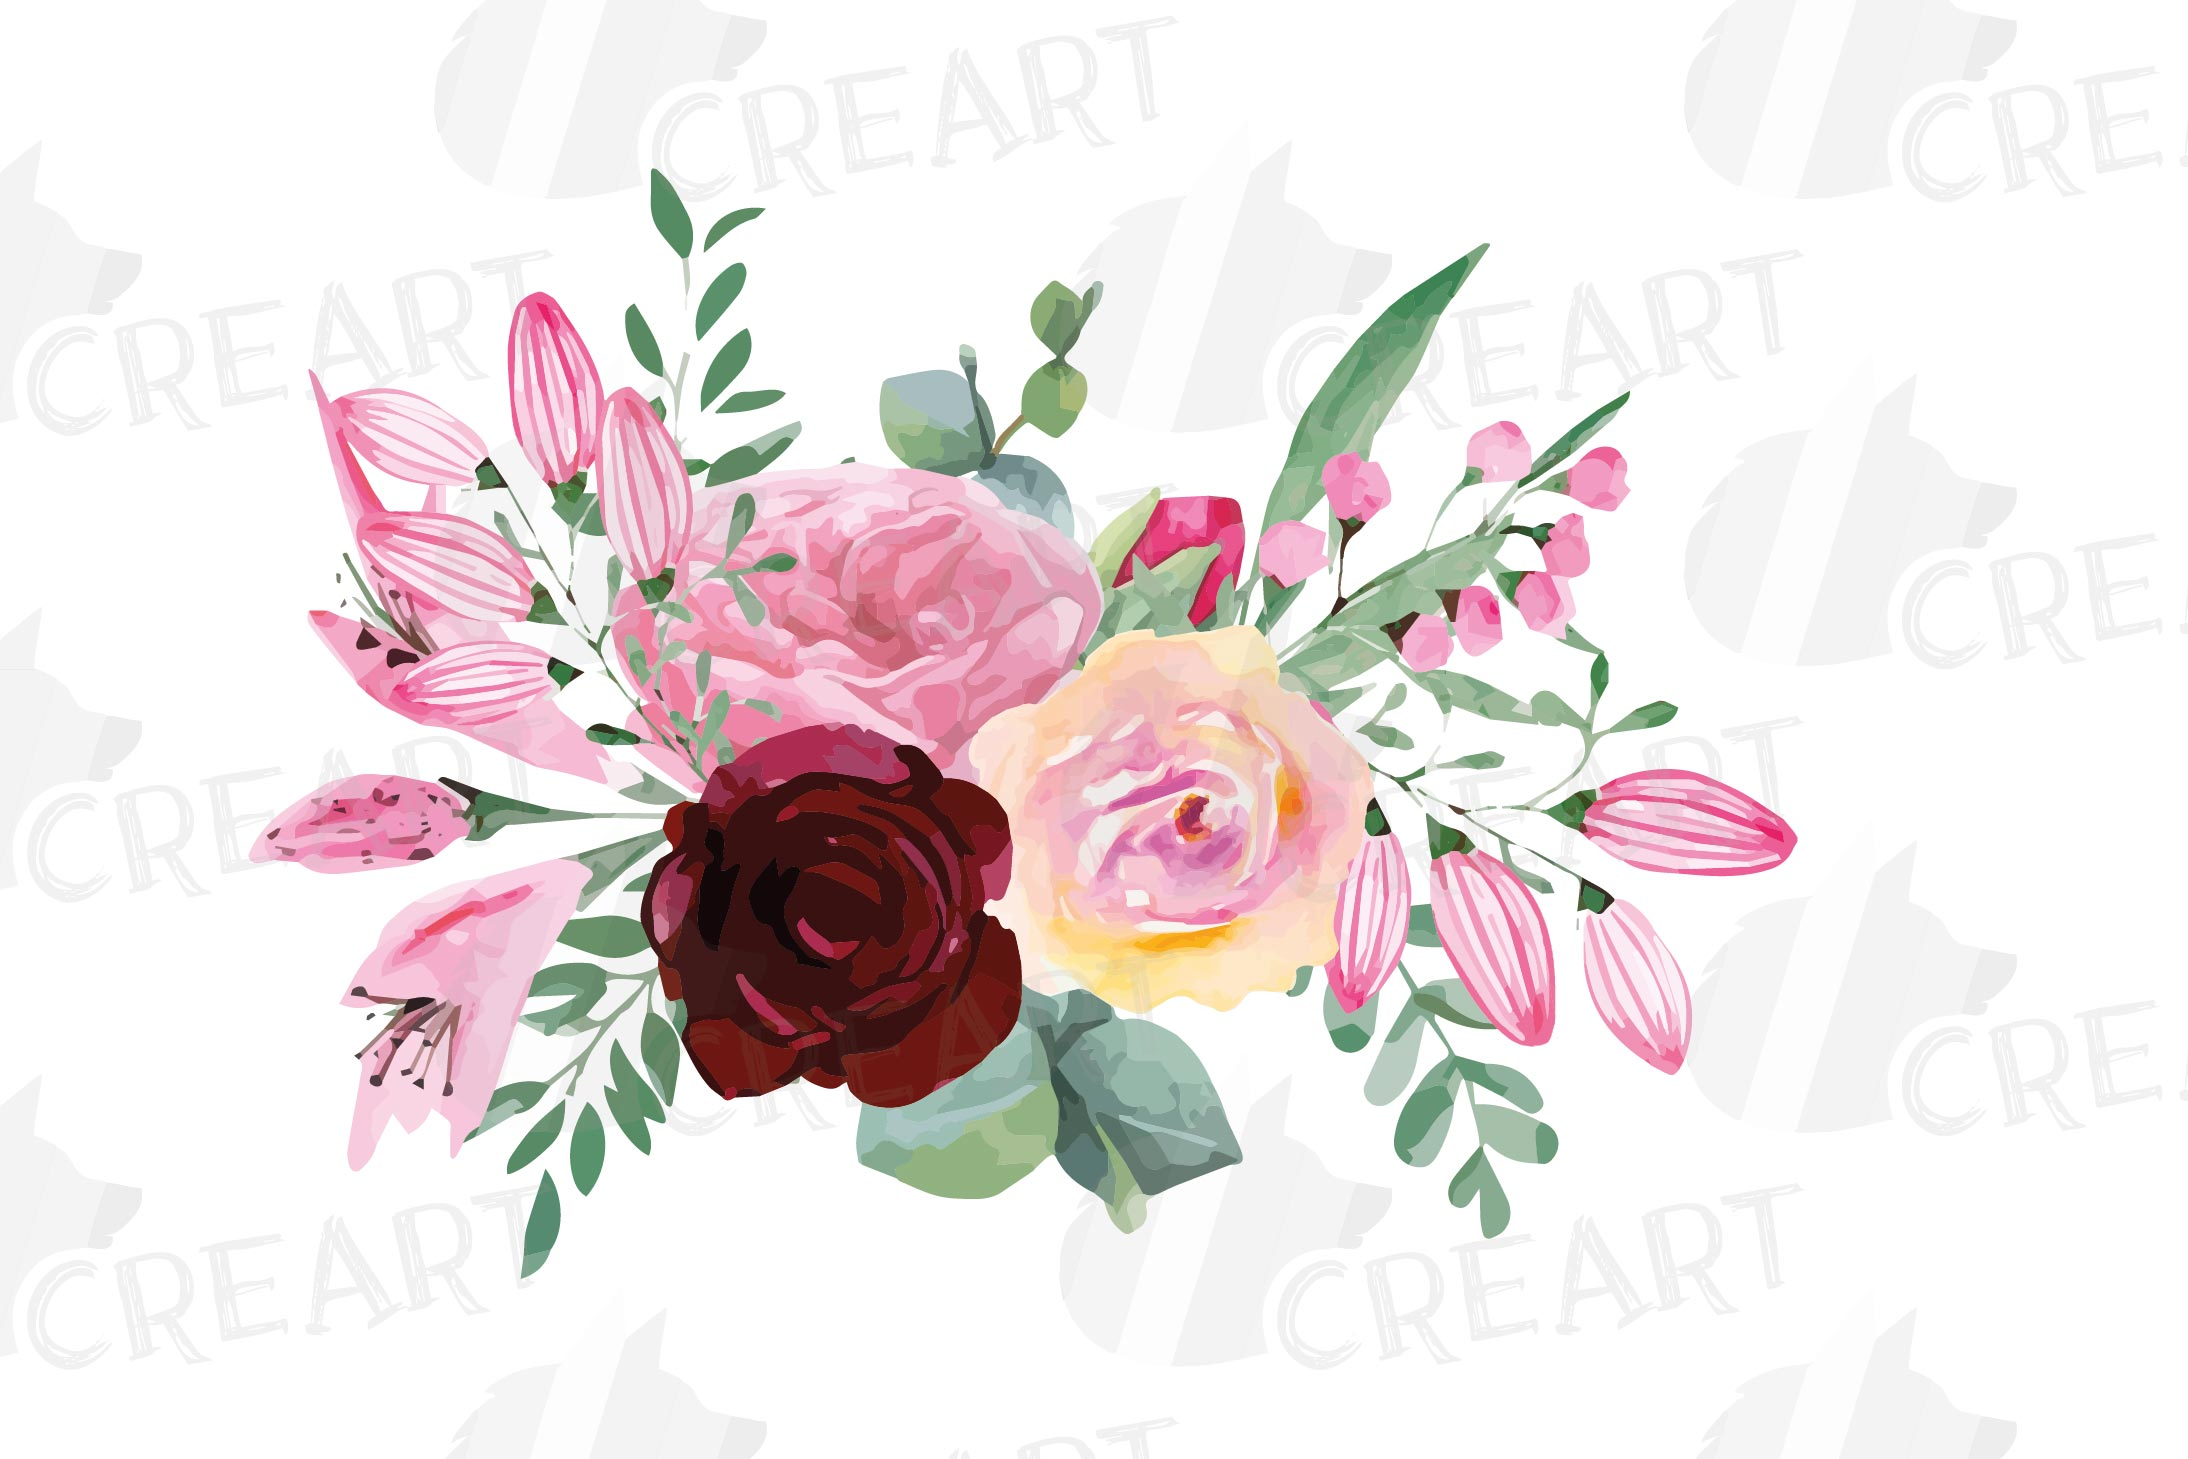 Watercolor elegant floral bouquets, rose, anemone decoration example image 14